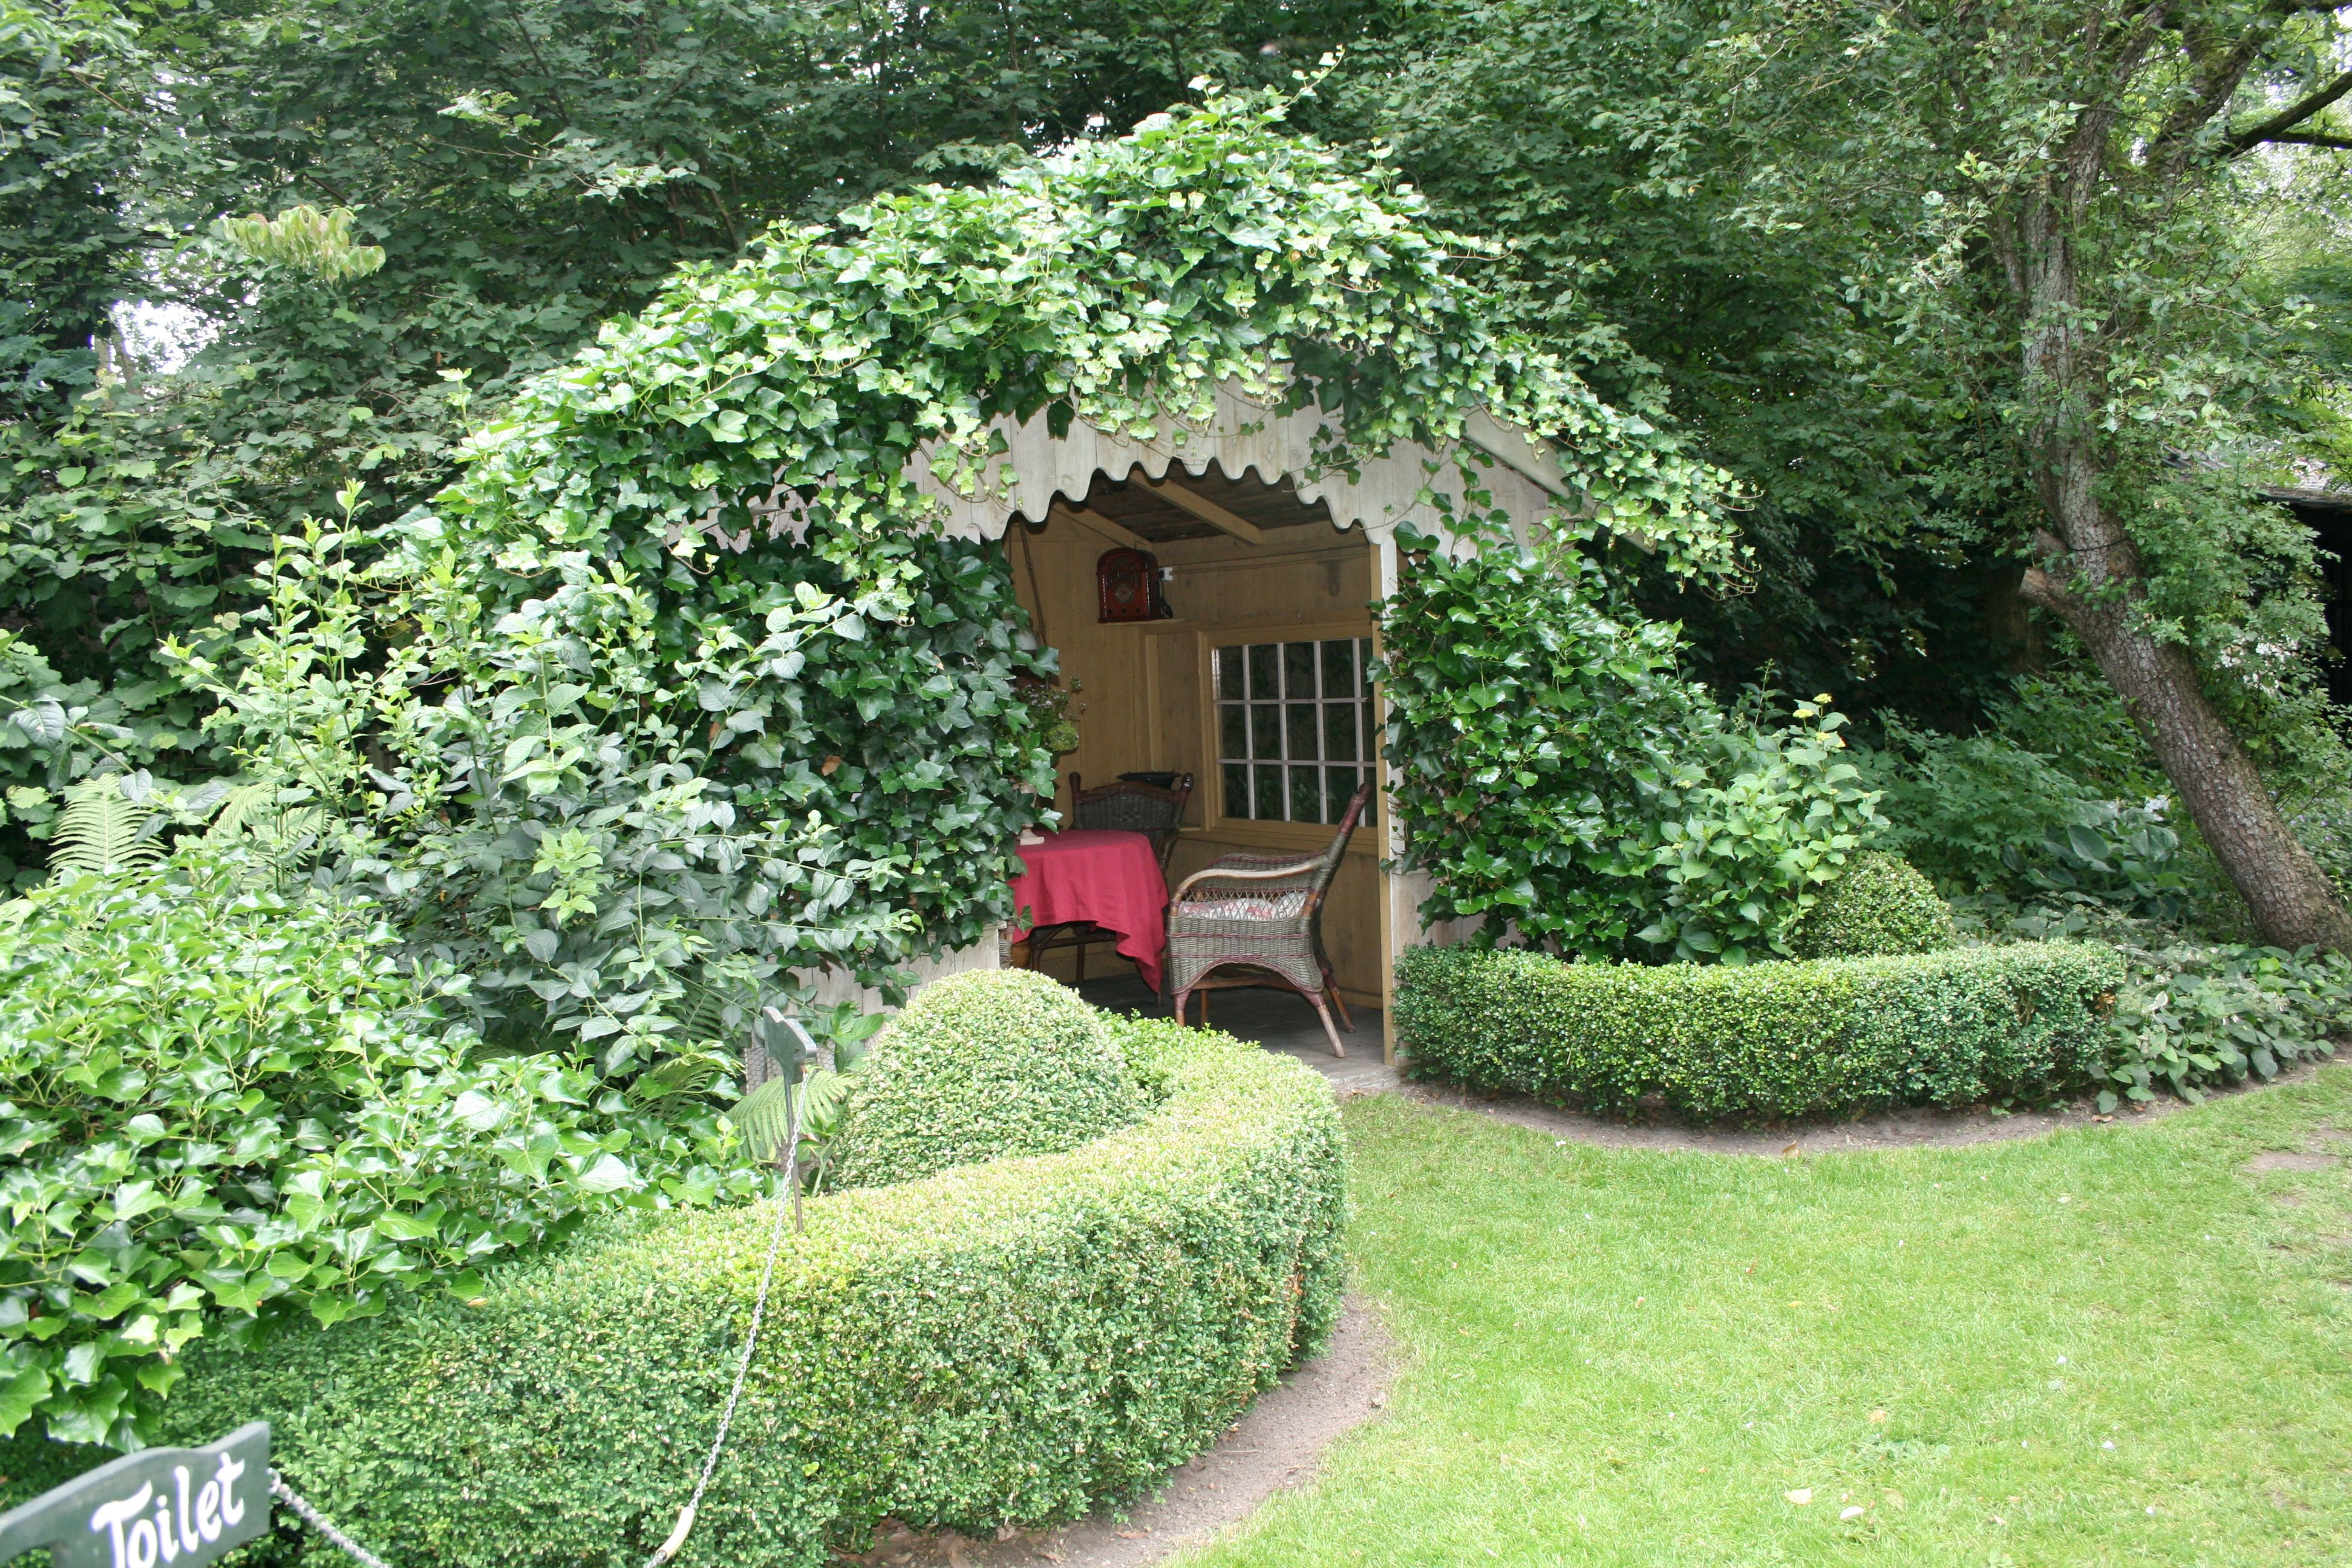 Sitzplätze Im Garten gartenreise sitzplätze im garten formschnitt buchs